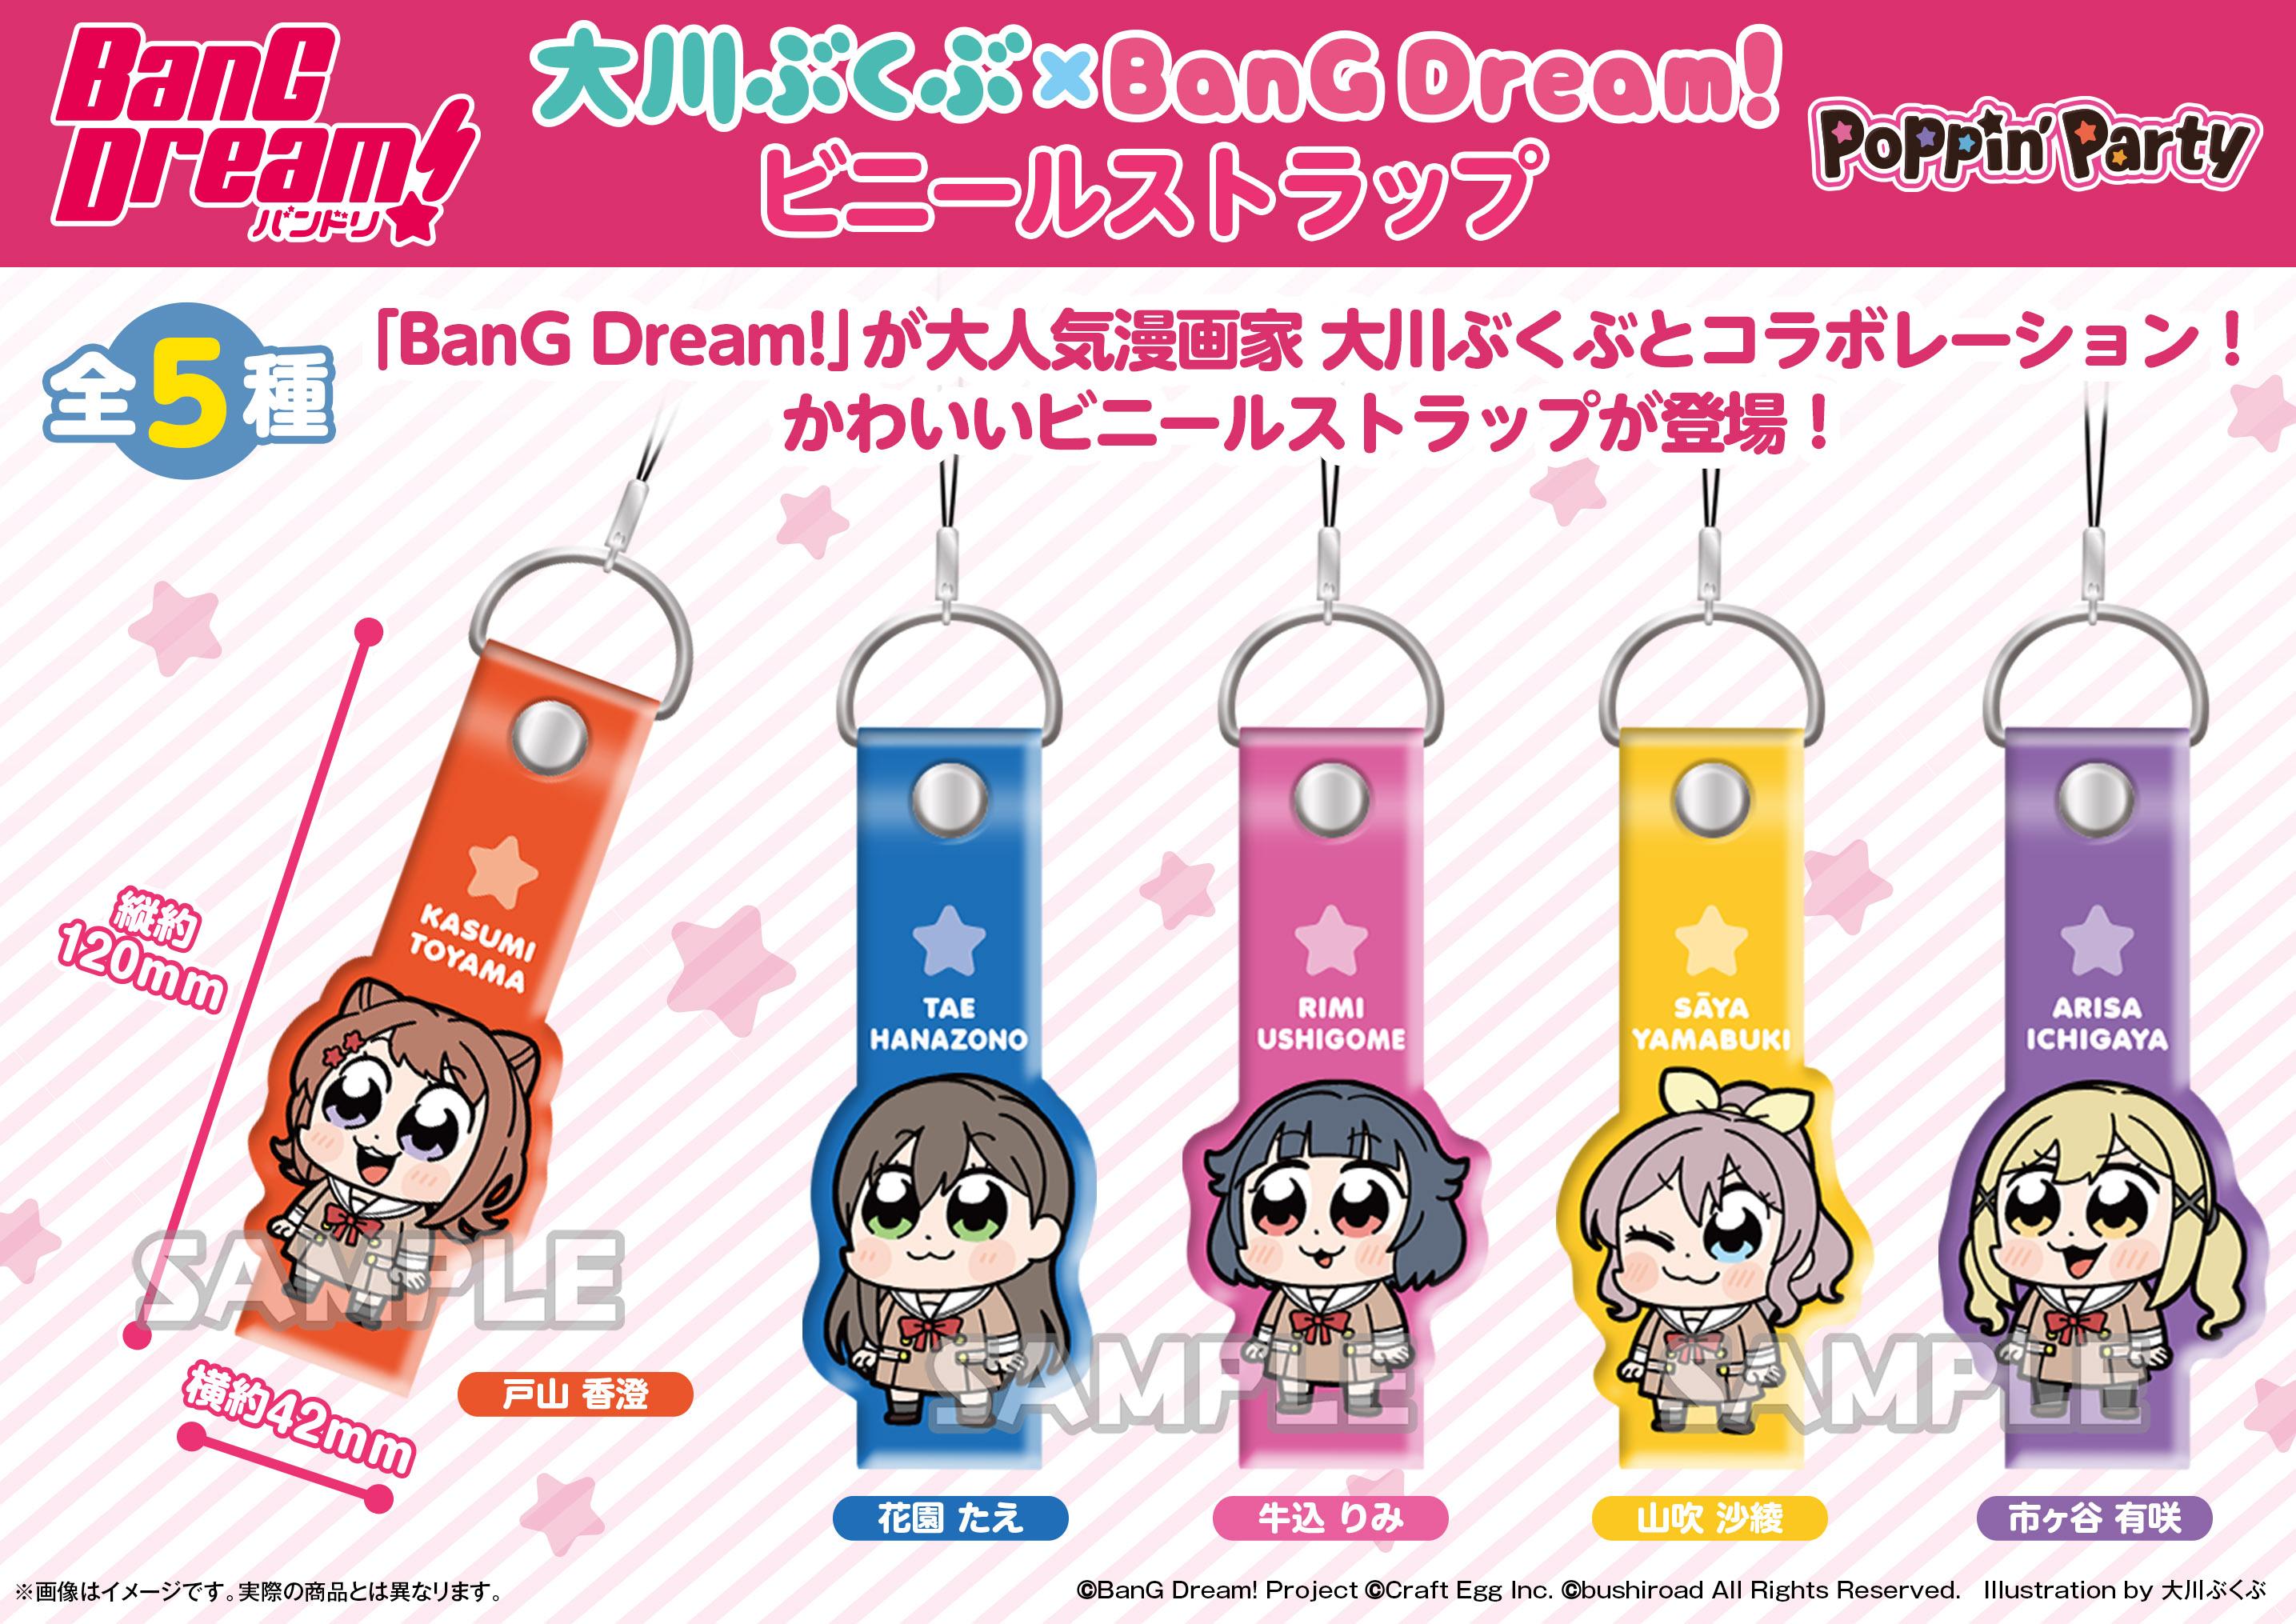 ★BanG Dream! 12月27日(金)新商品案内★